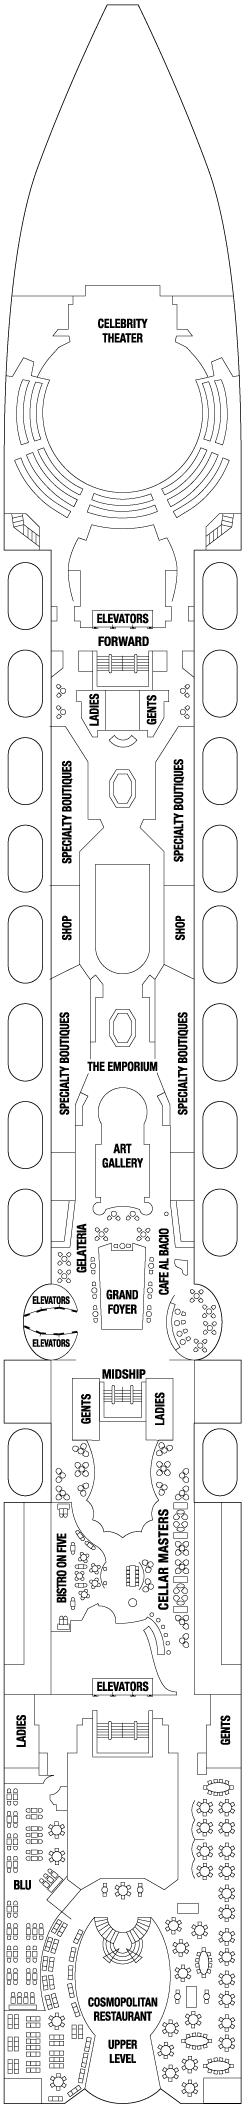 Entertainment Deck